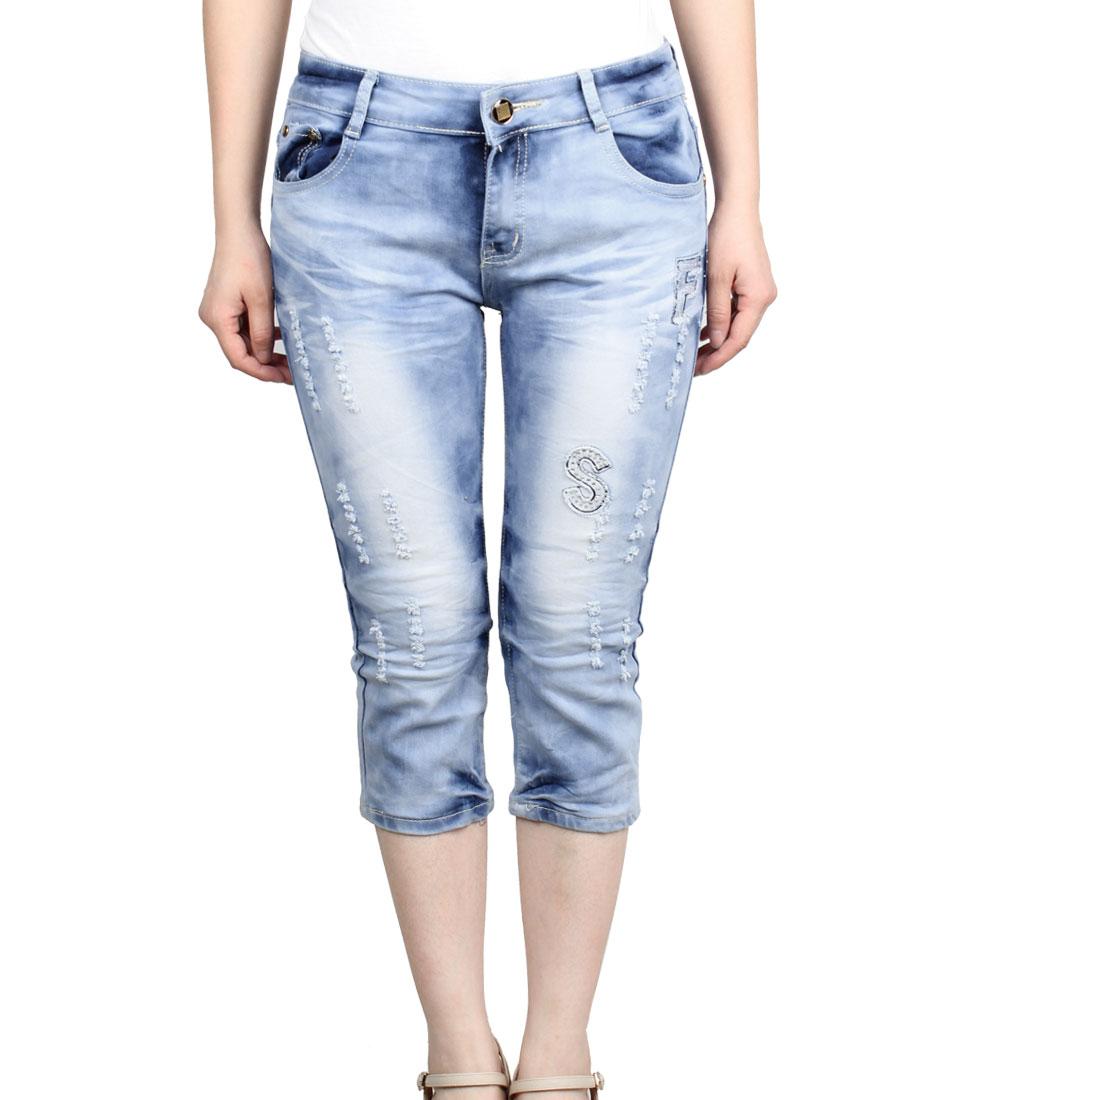 Women Slanting Pockets Button Closure Fashional Cropped Jeans Light Blue S